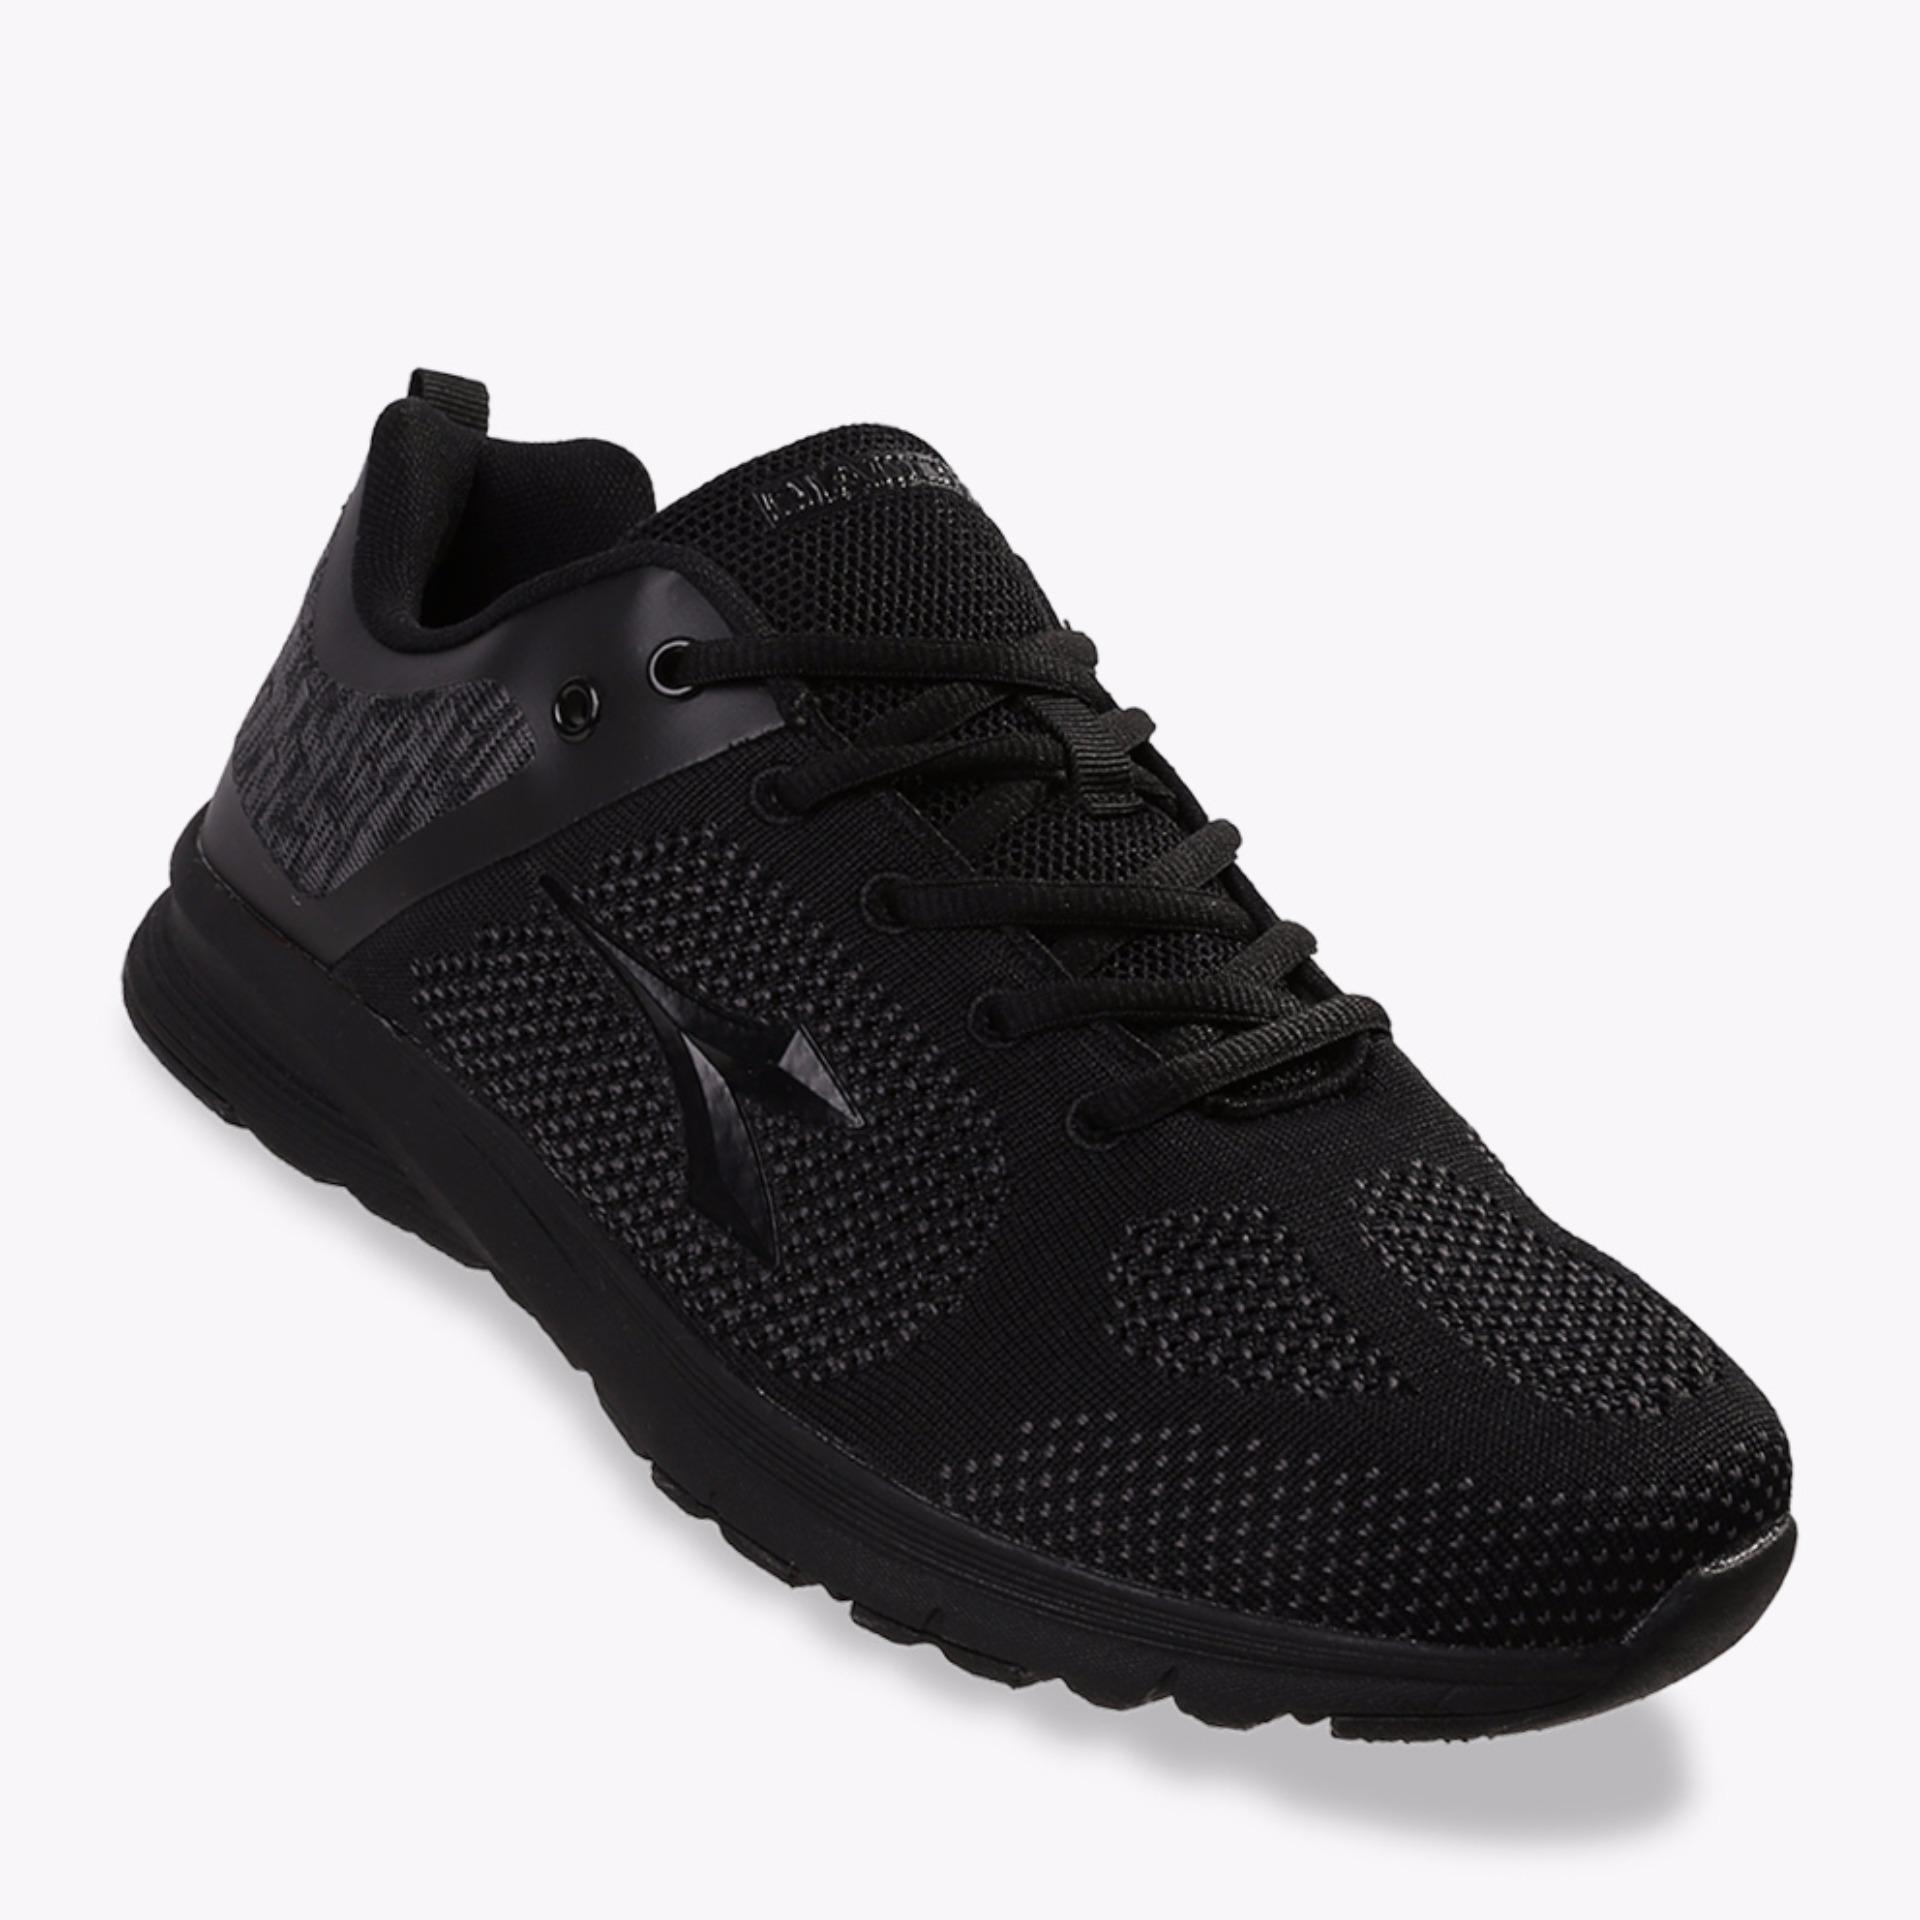 Jual Cepat Diadora Gabrio Men S Running Shoes Hitam